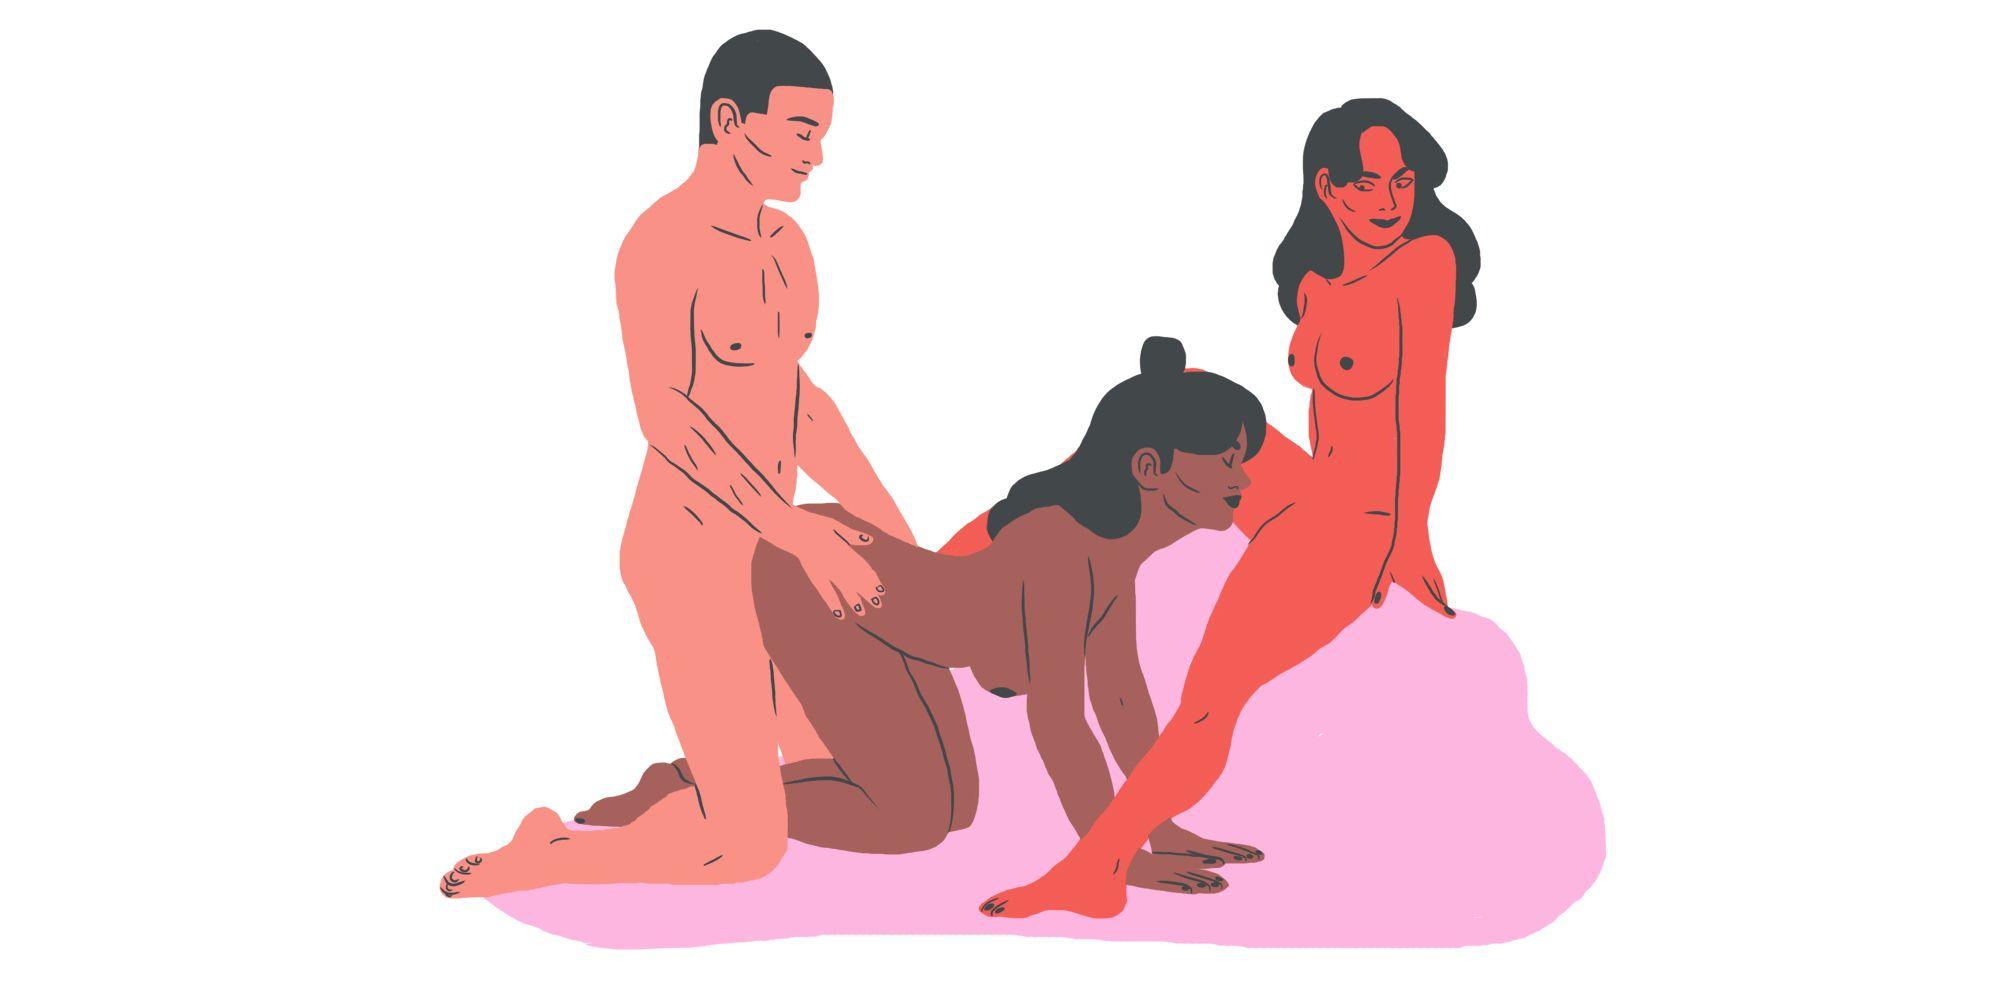 Tess taylor nude animated gifs